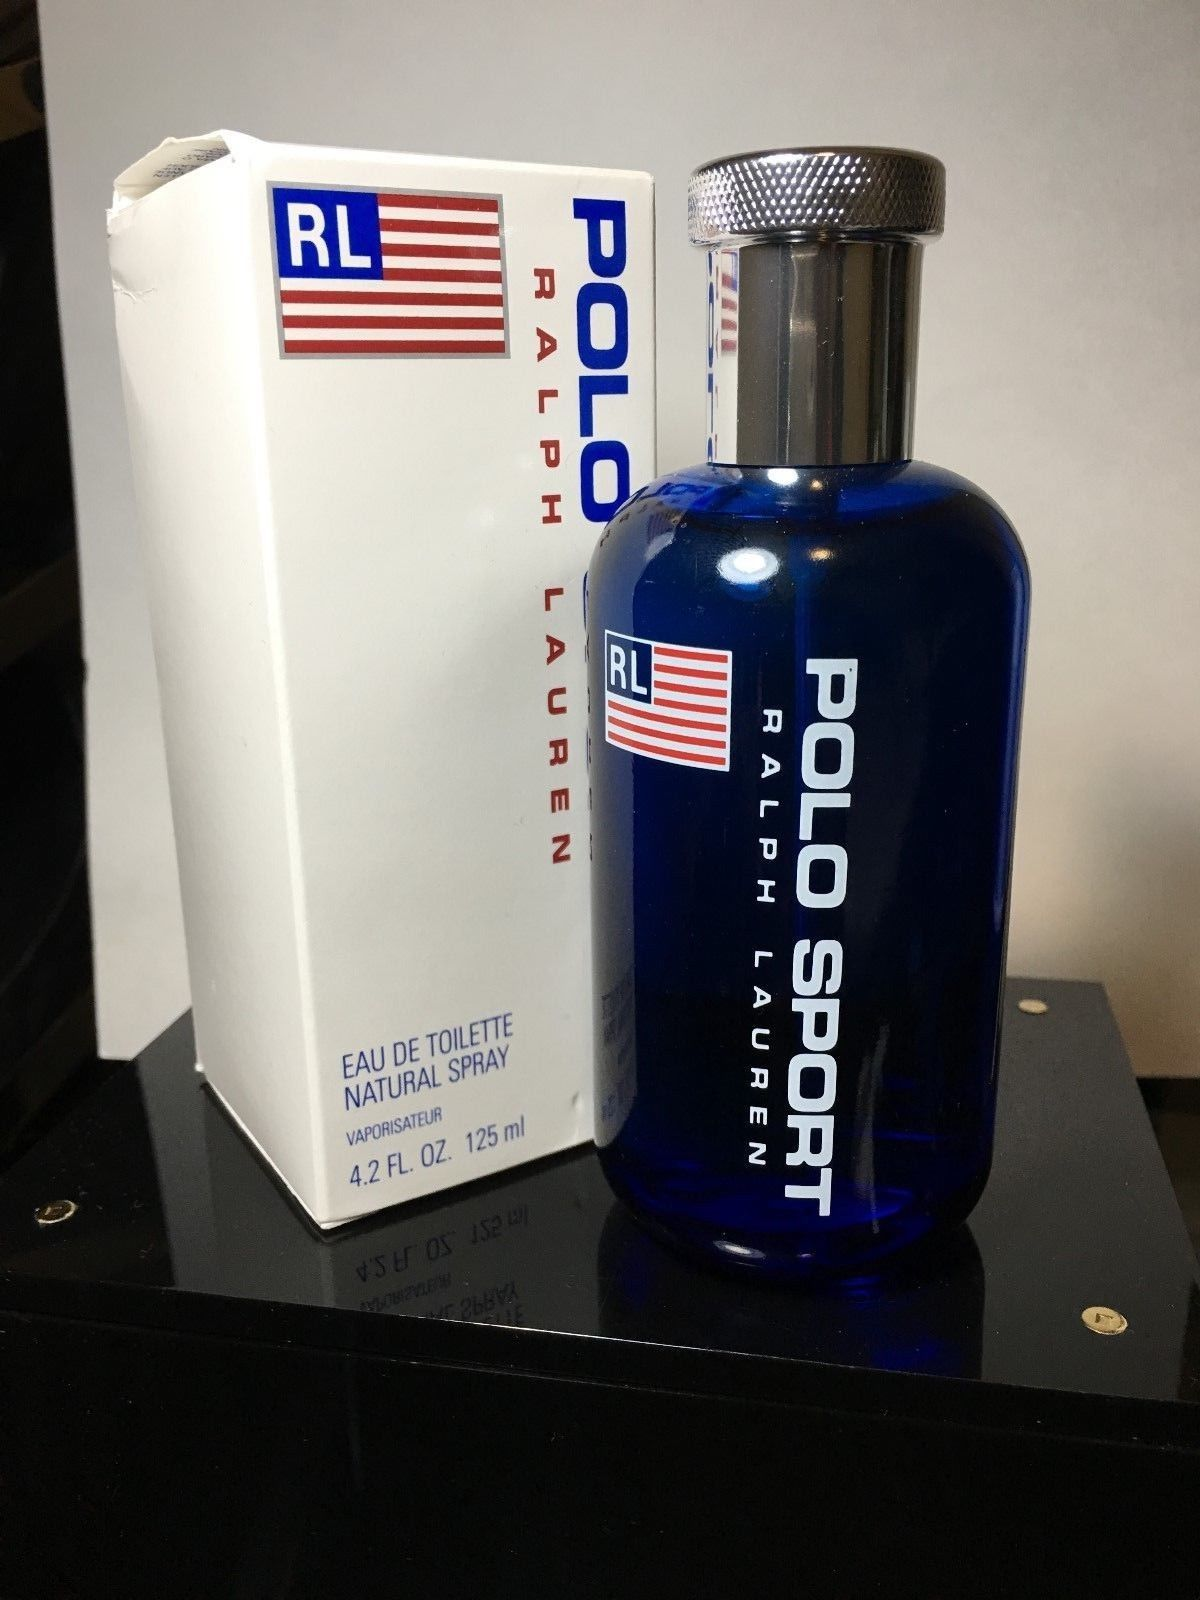 89.95 Polo Sport by Ralph Lauren for Men 4.2 oz EDT